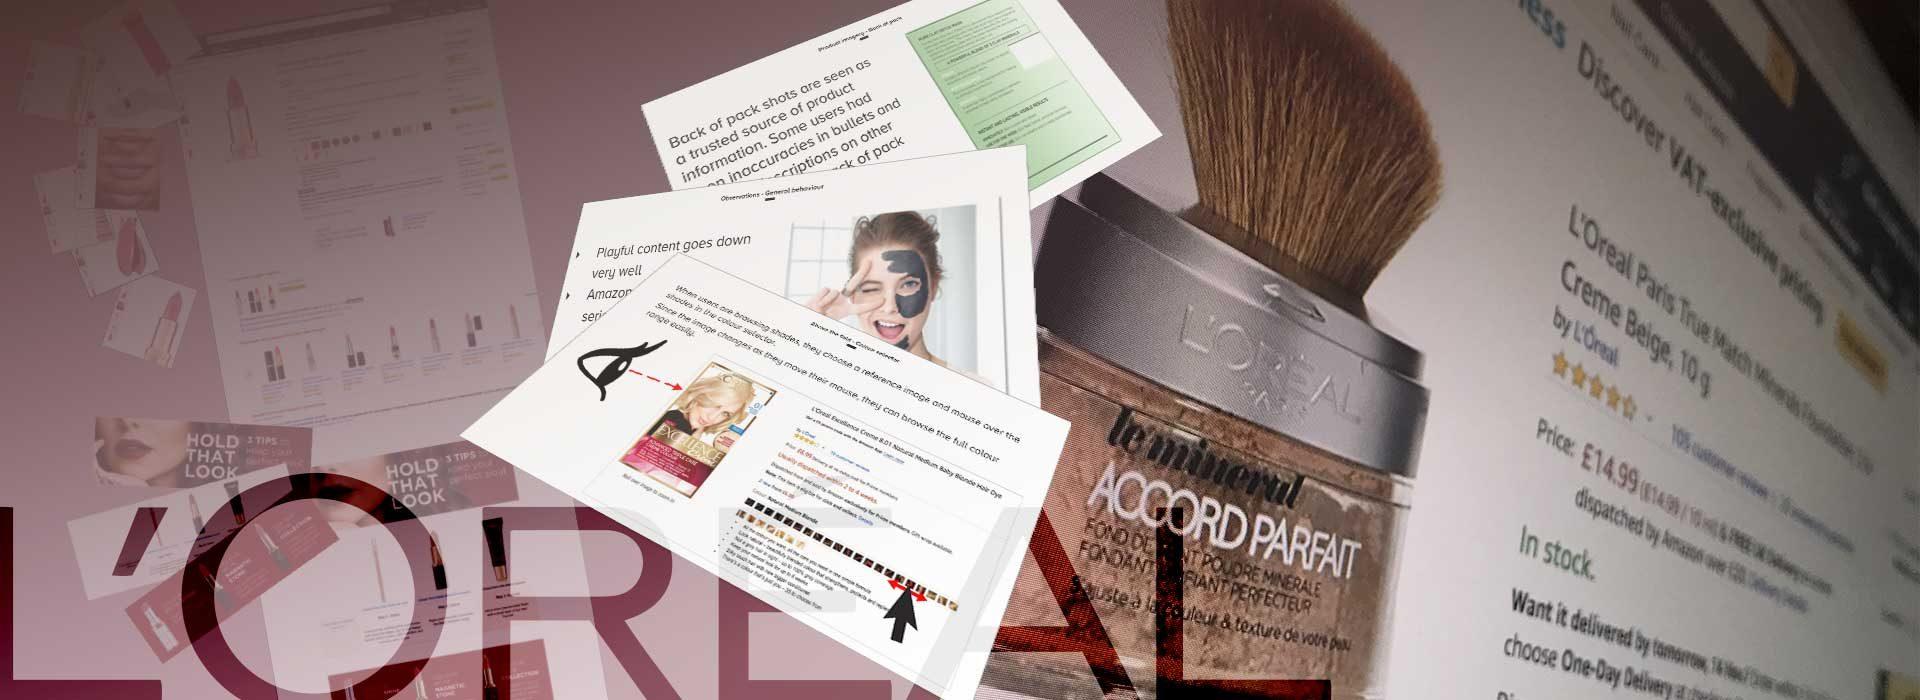 Header image for L'Oréal project